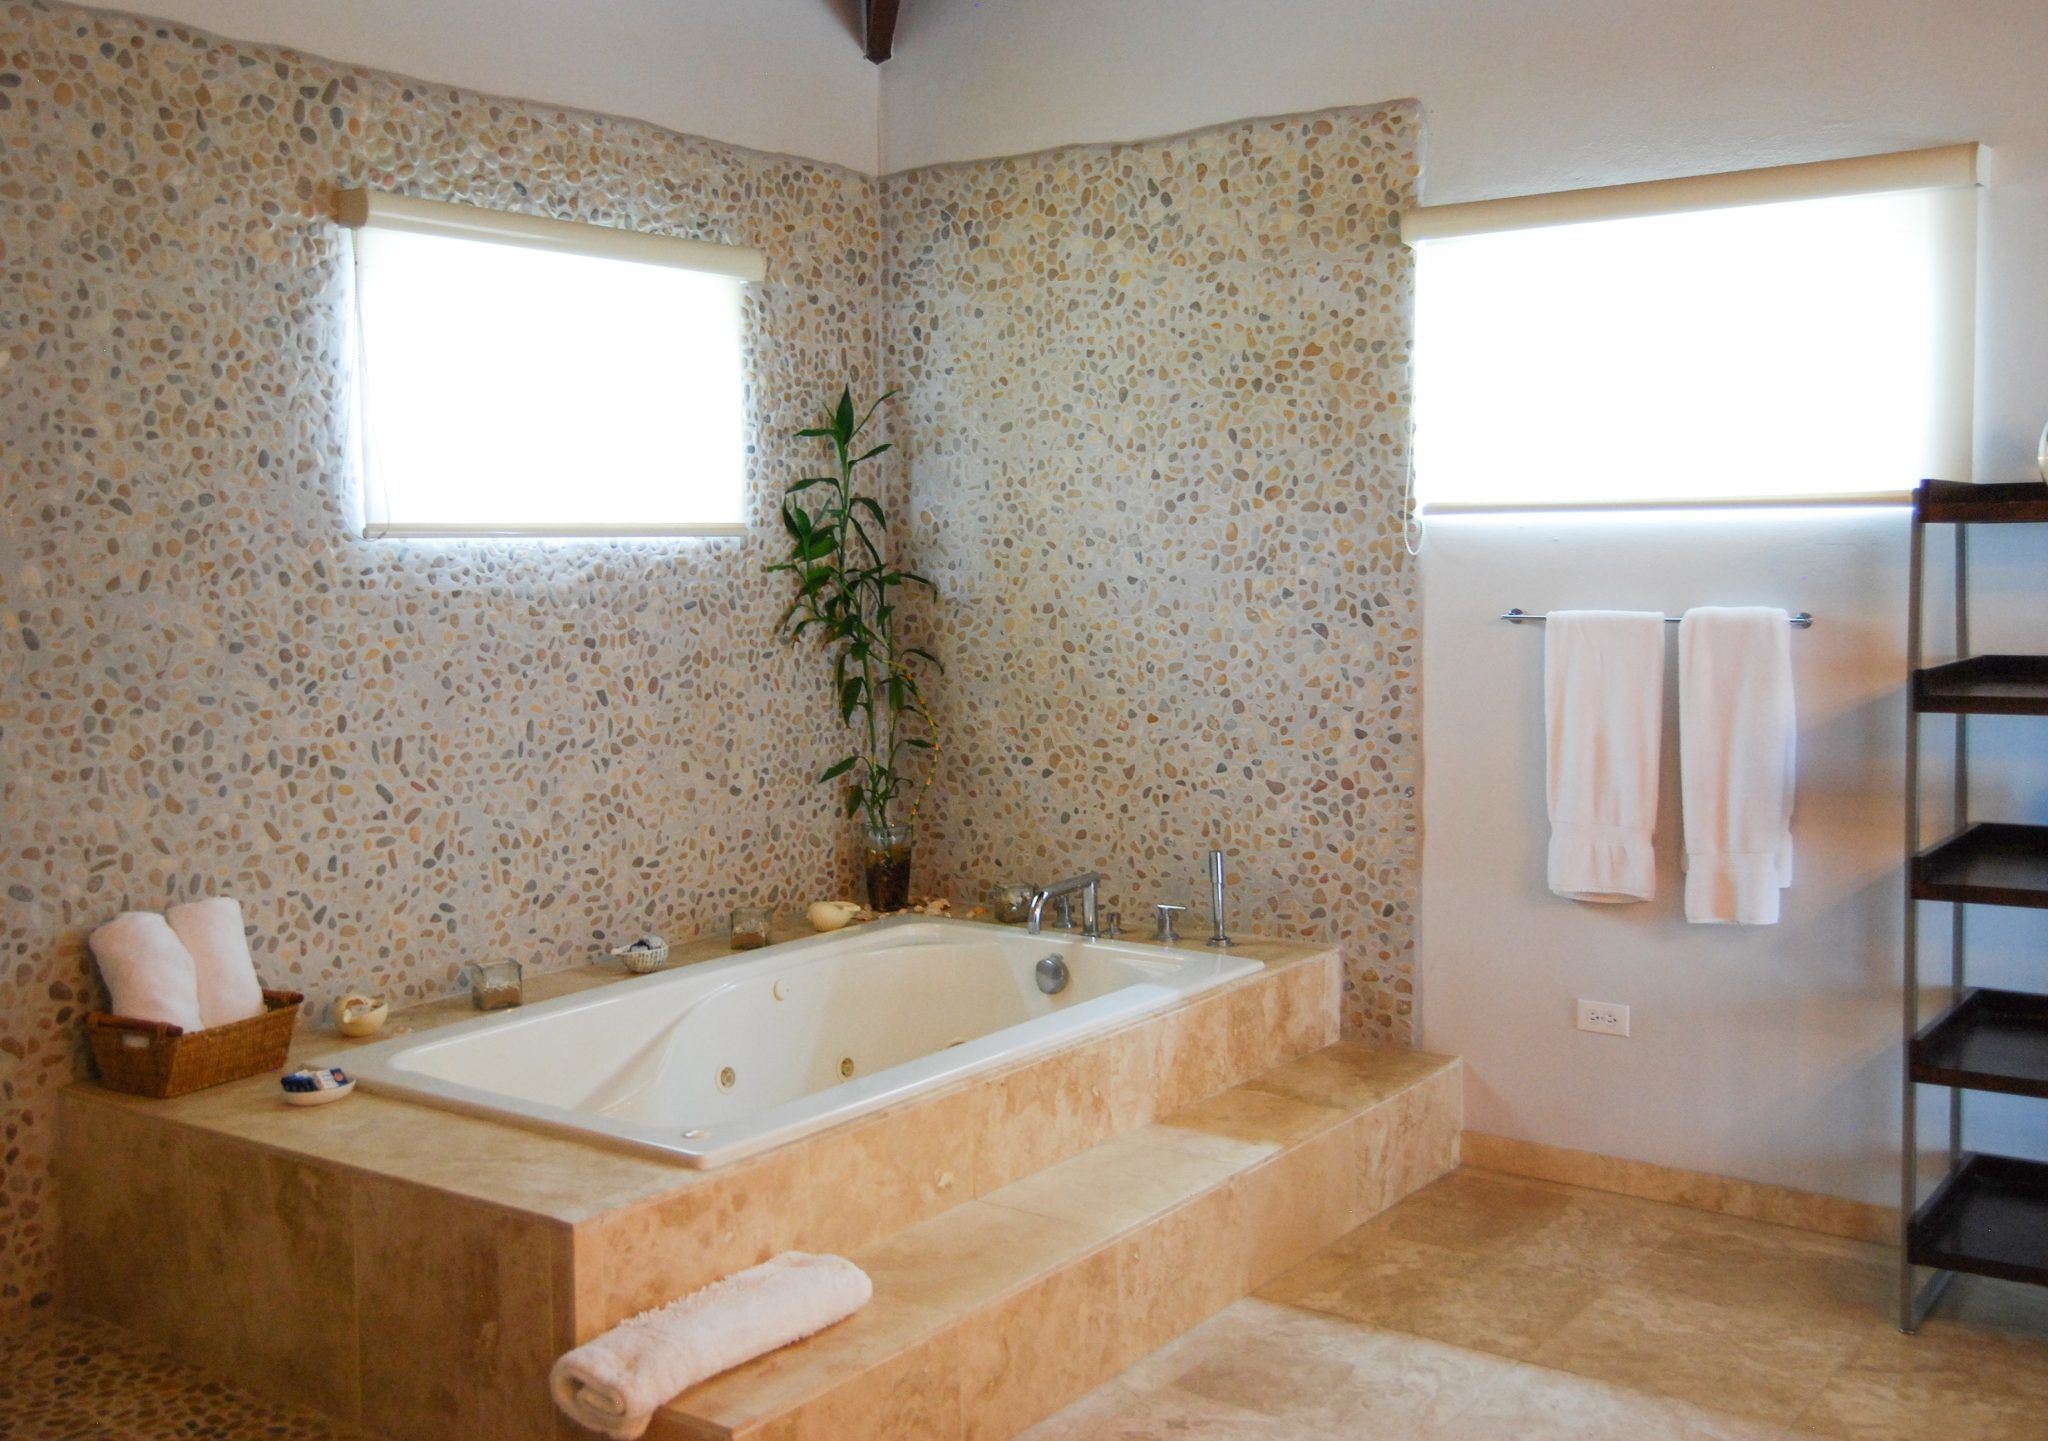 The Spectacular Master Bath